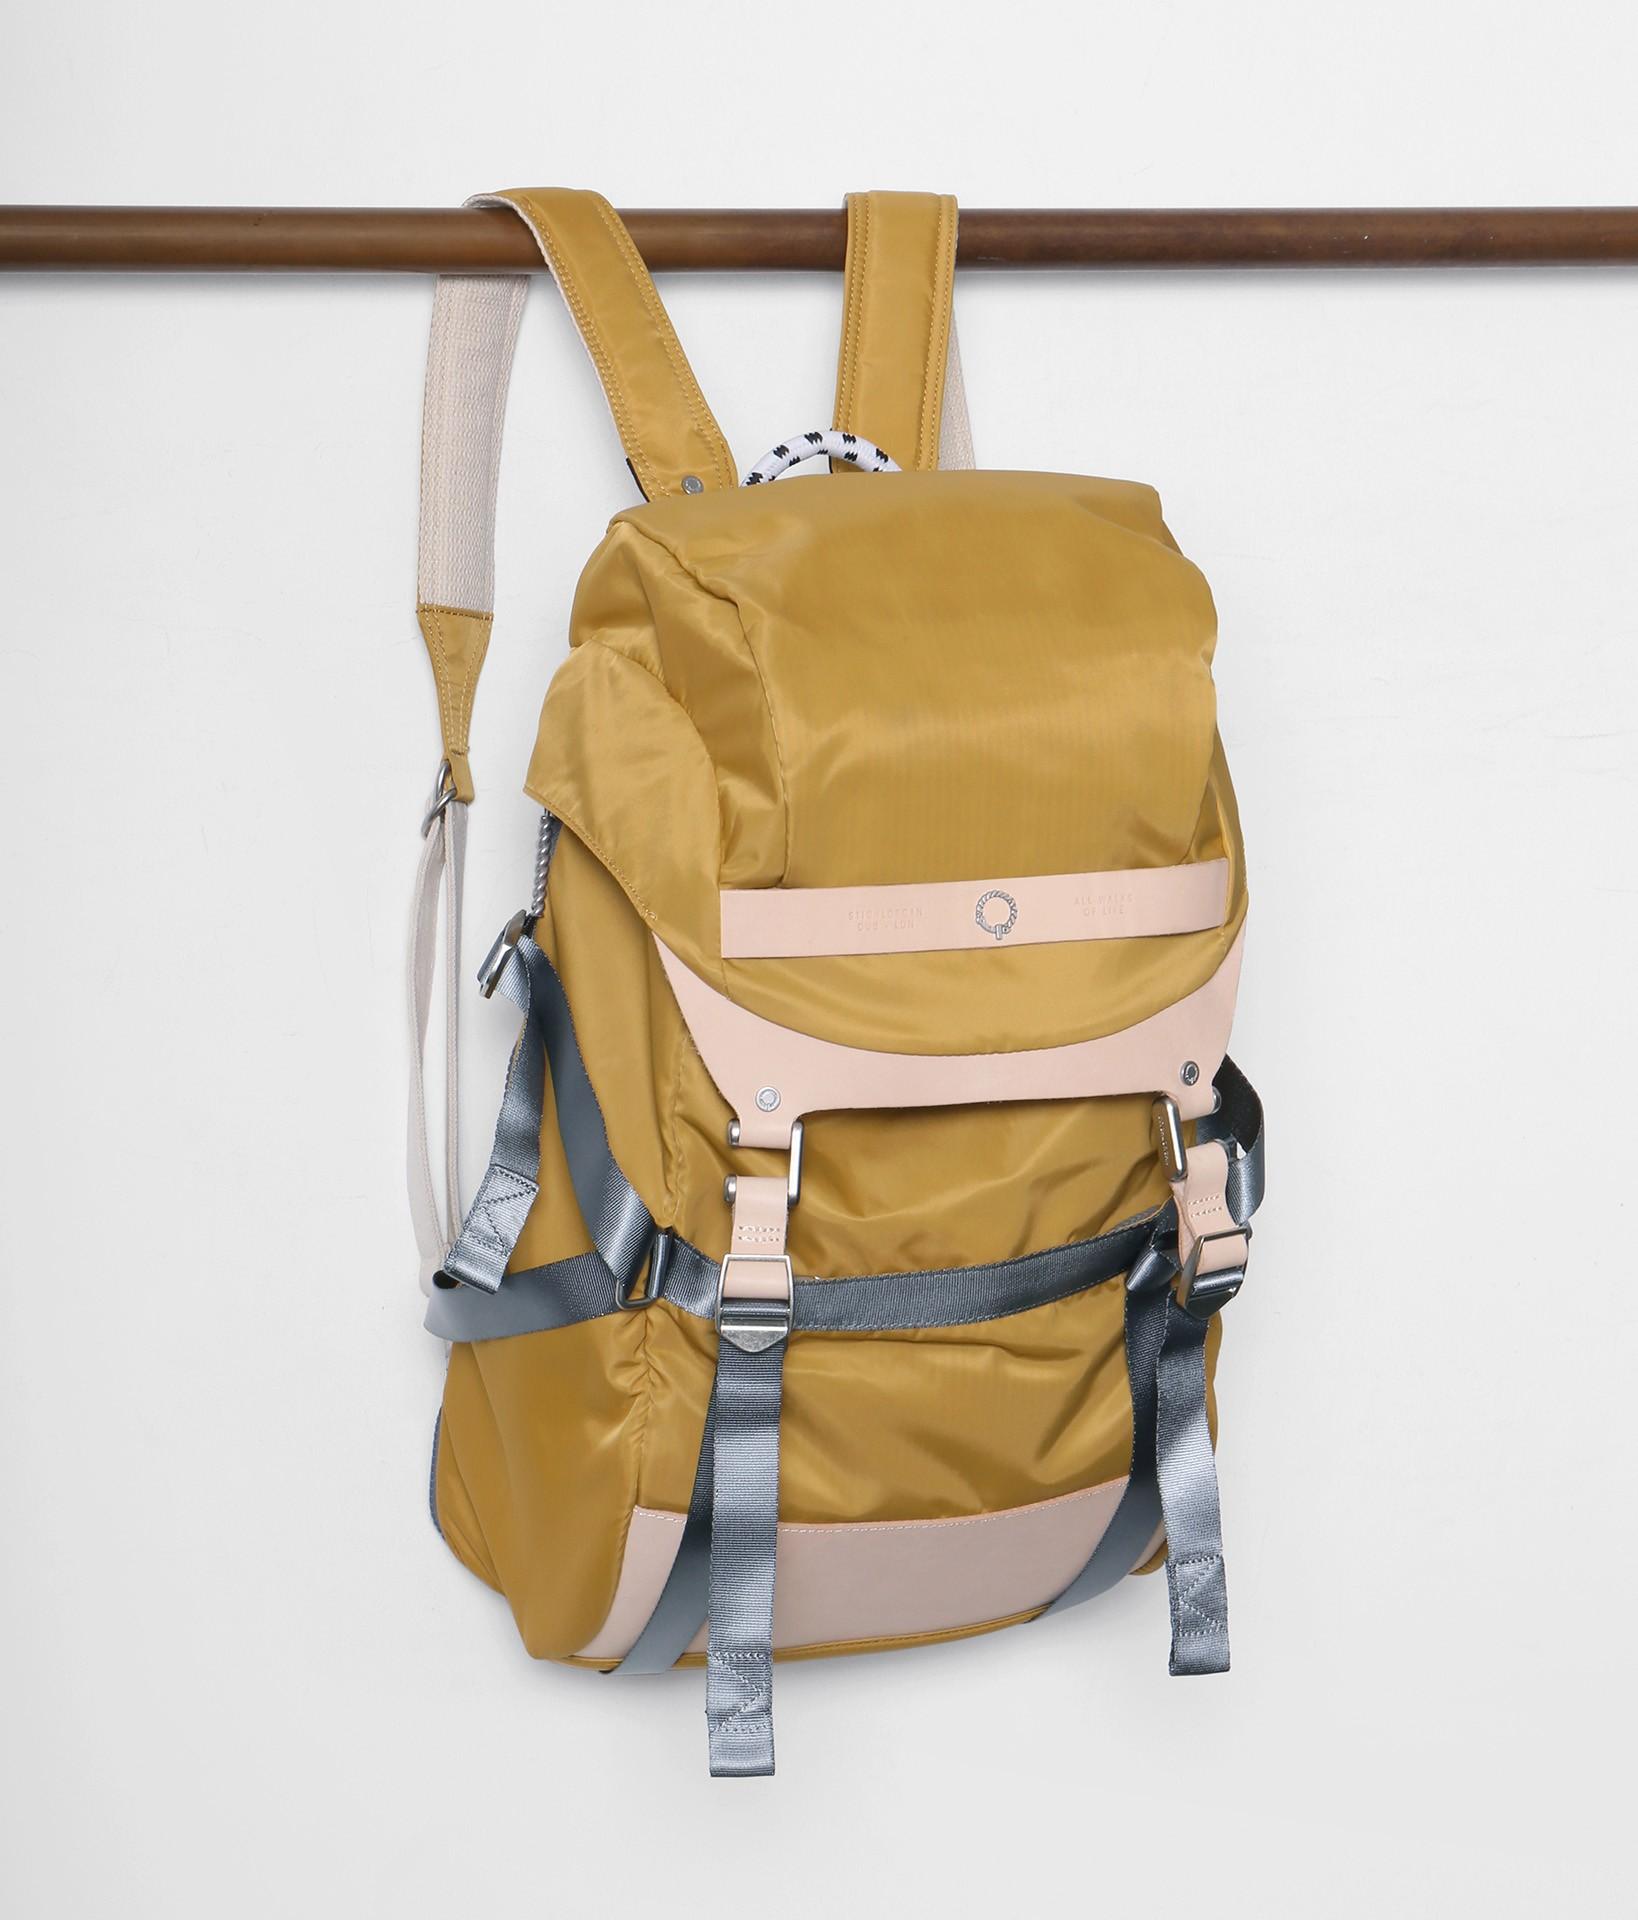 c7301510daa0 Stighlorgan - Plato laptop backpack - sun yellow